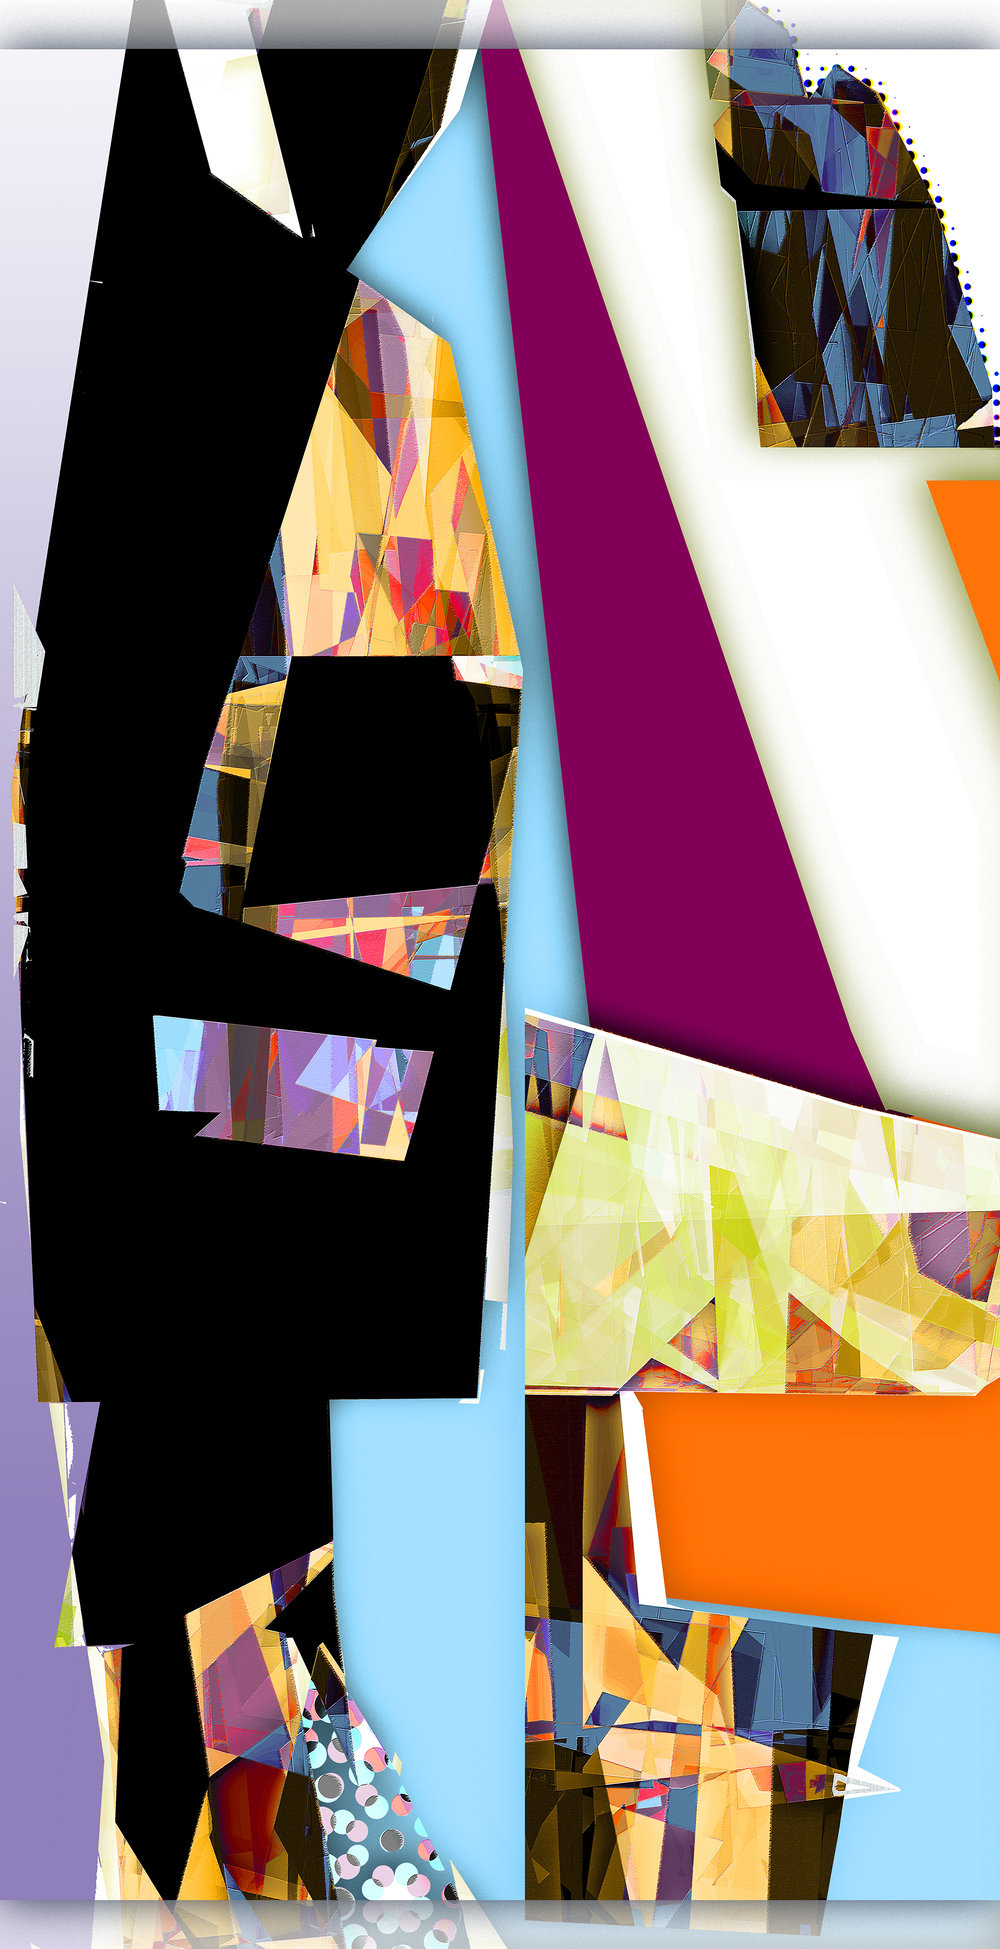 181208 Puzzle Piece